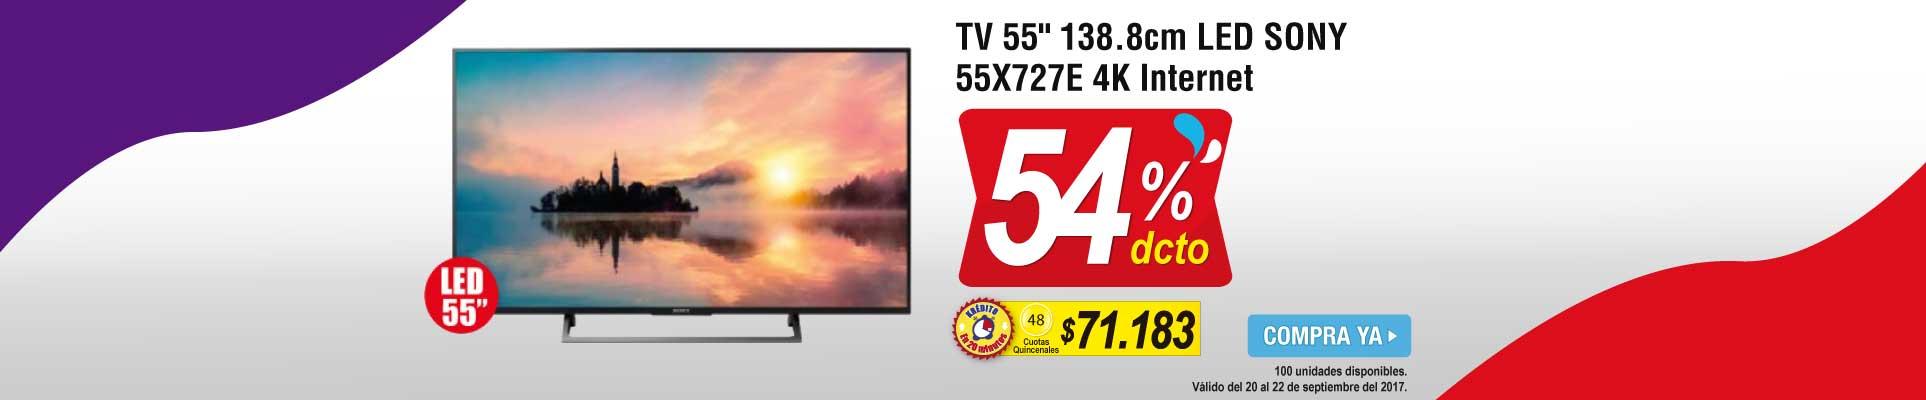 PPAL ALKP-4-tv-TV 55 138.8cm LED SONY 55X727E-prod-septiembre20-22